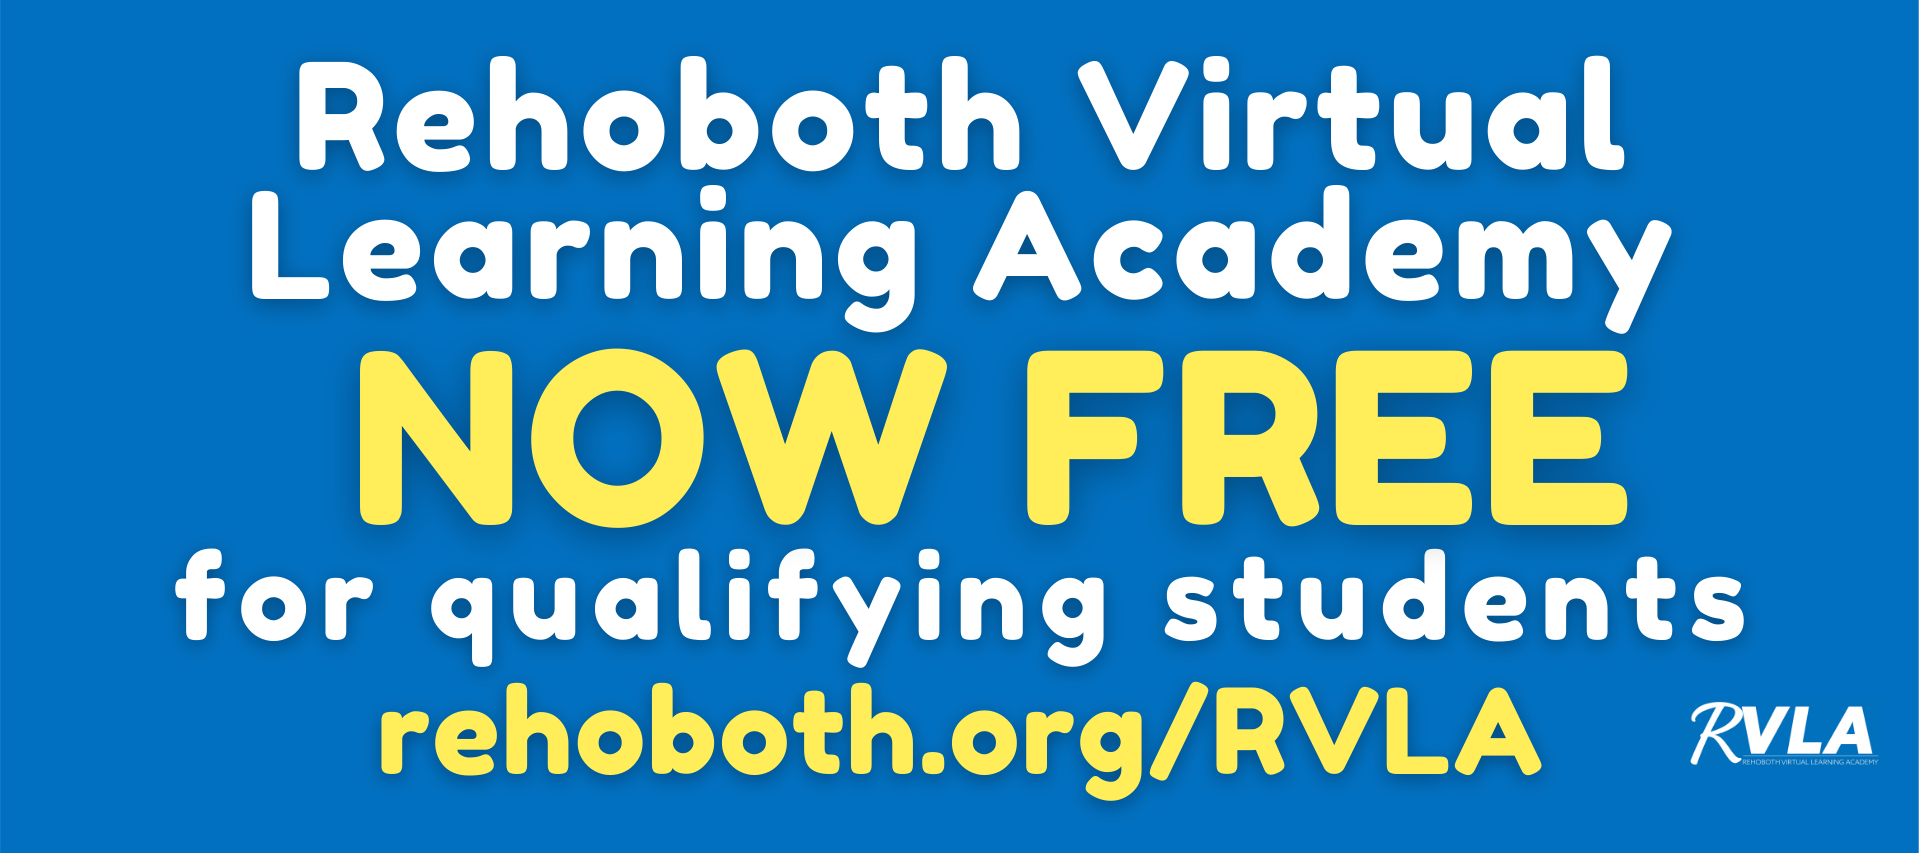 website RVLA free